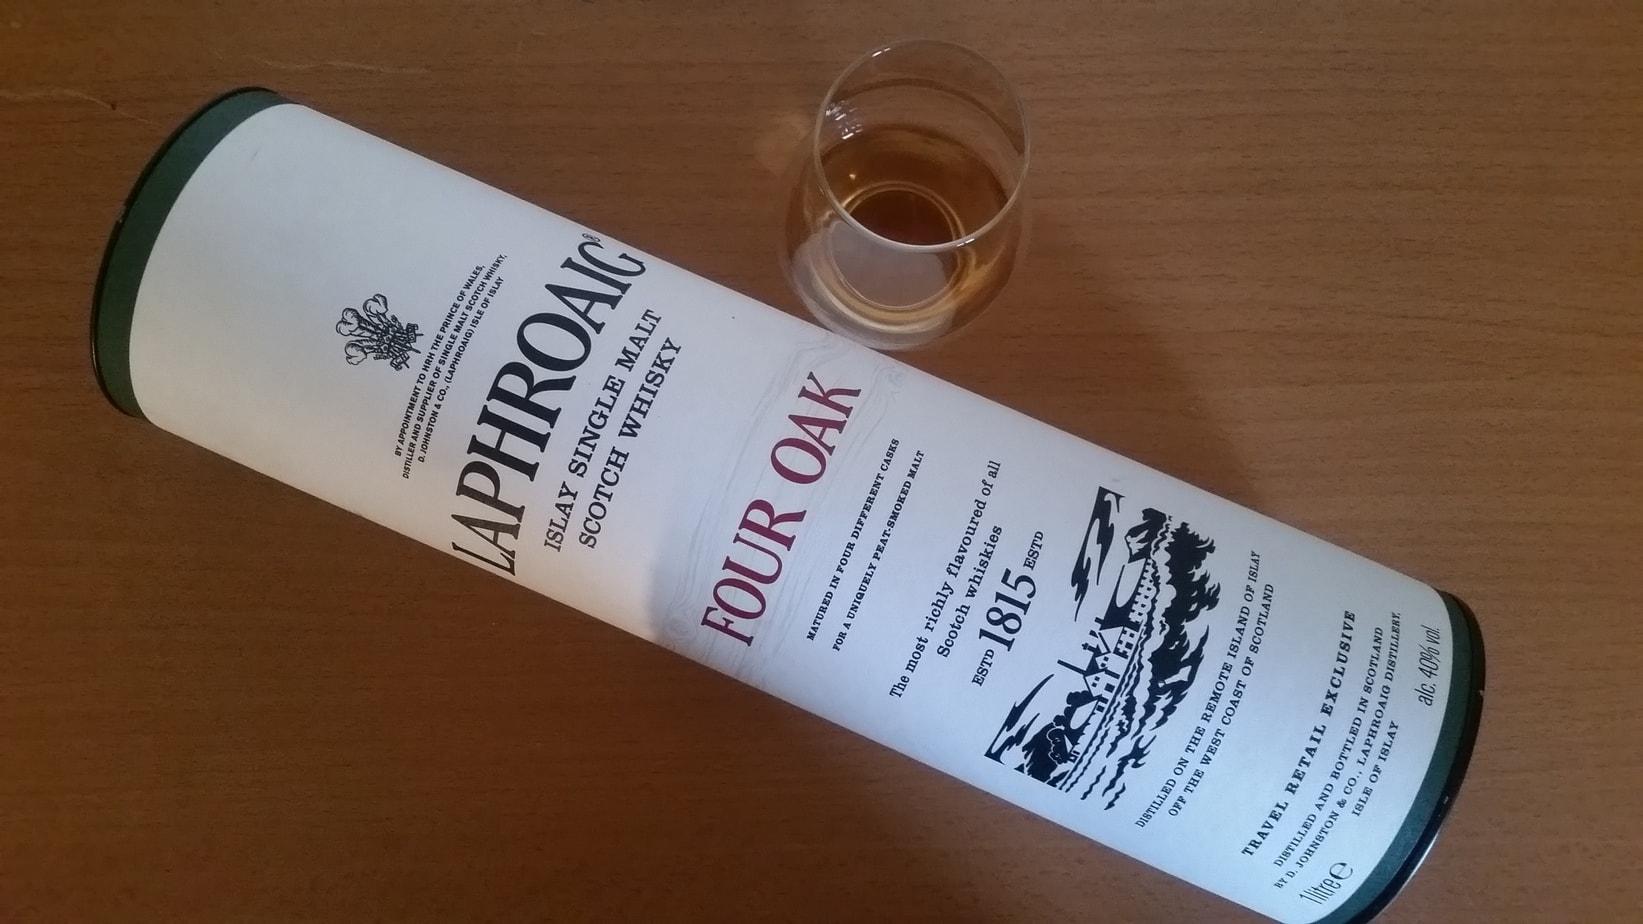 A bottle and glass of Laphroaig Four Oak